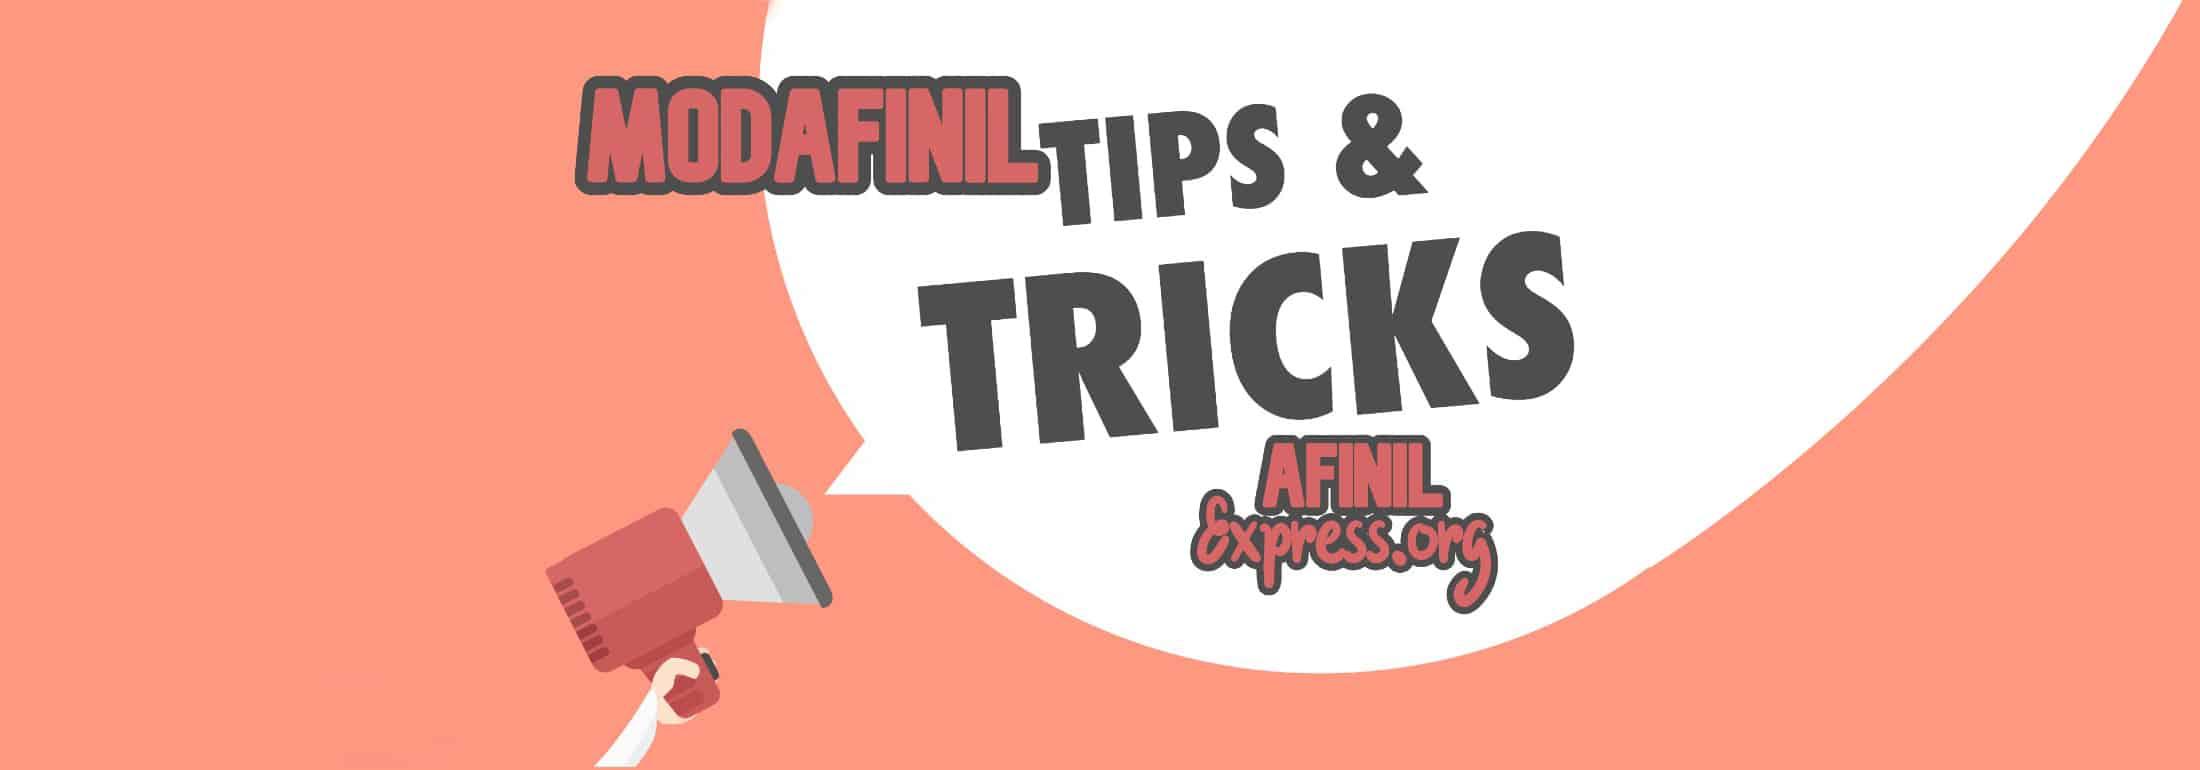 modafinil tips and tricks, afinilexpress.org